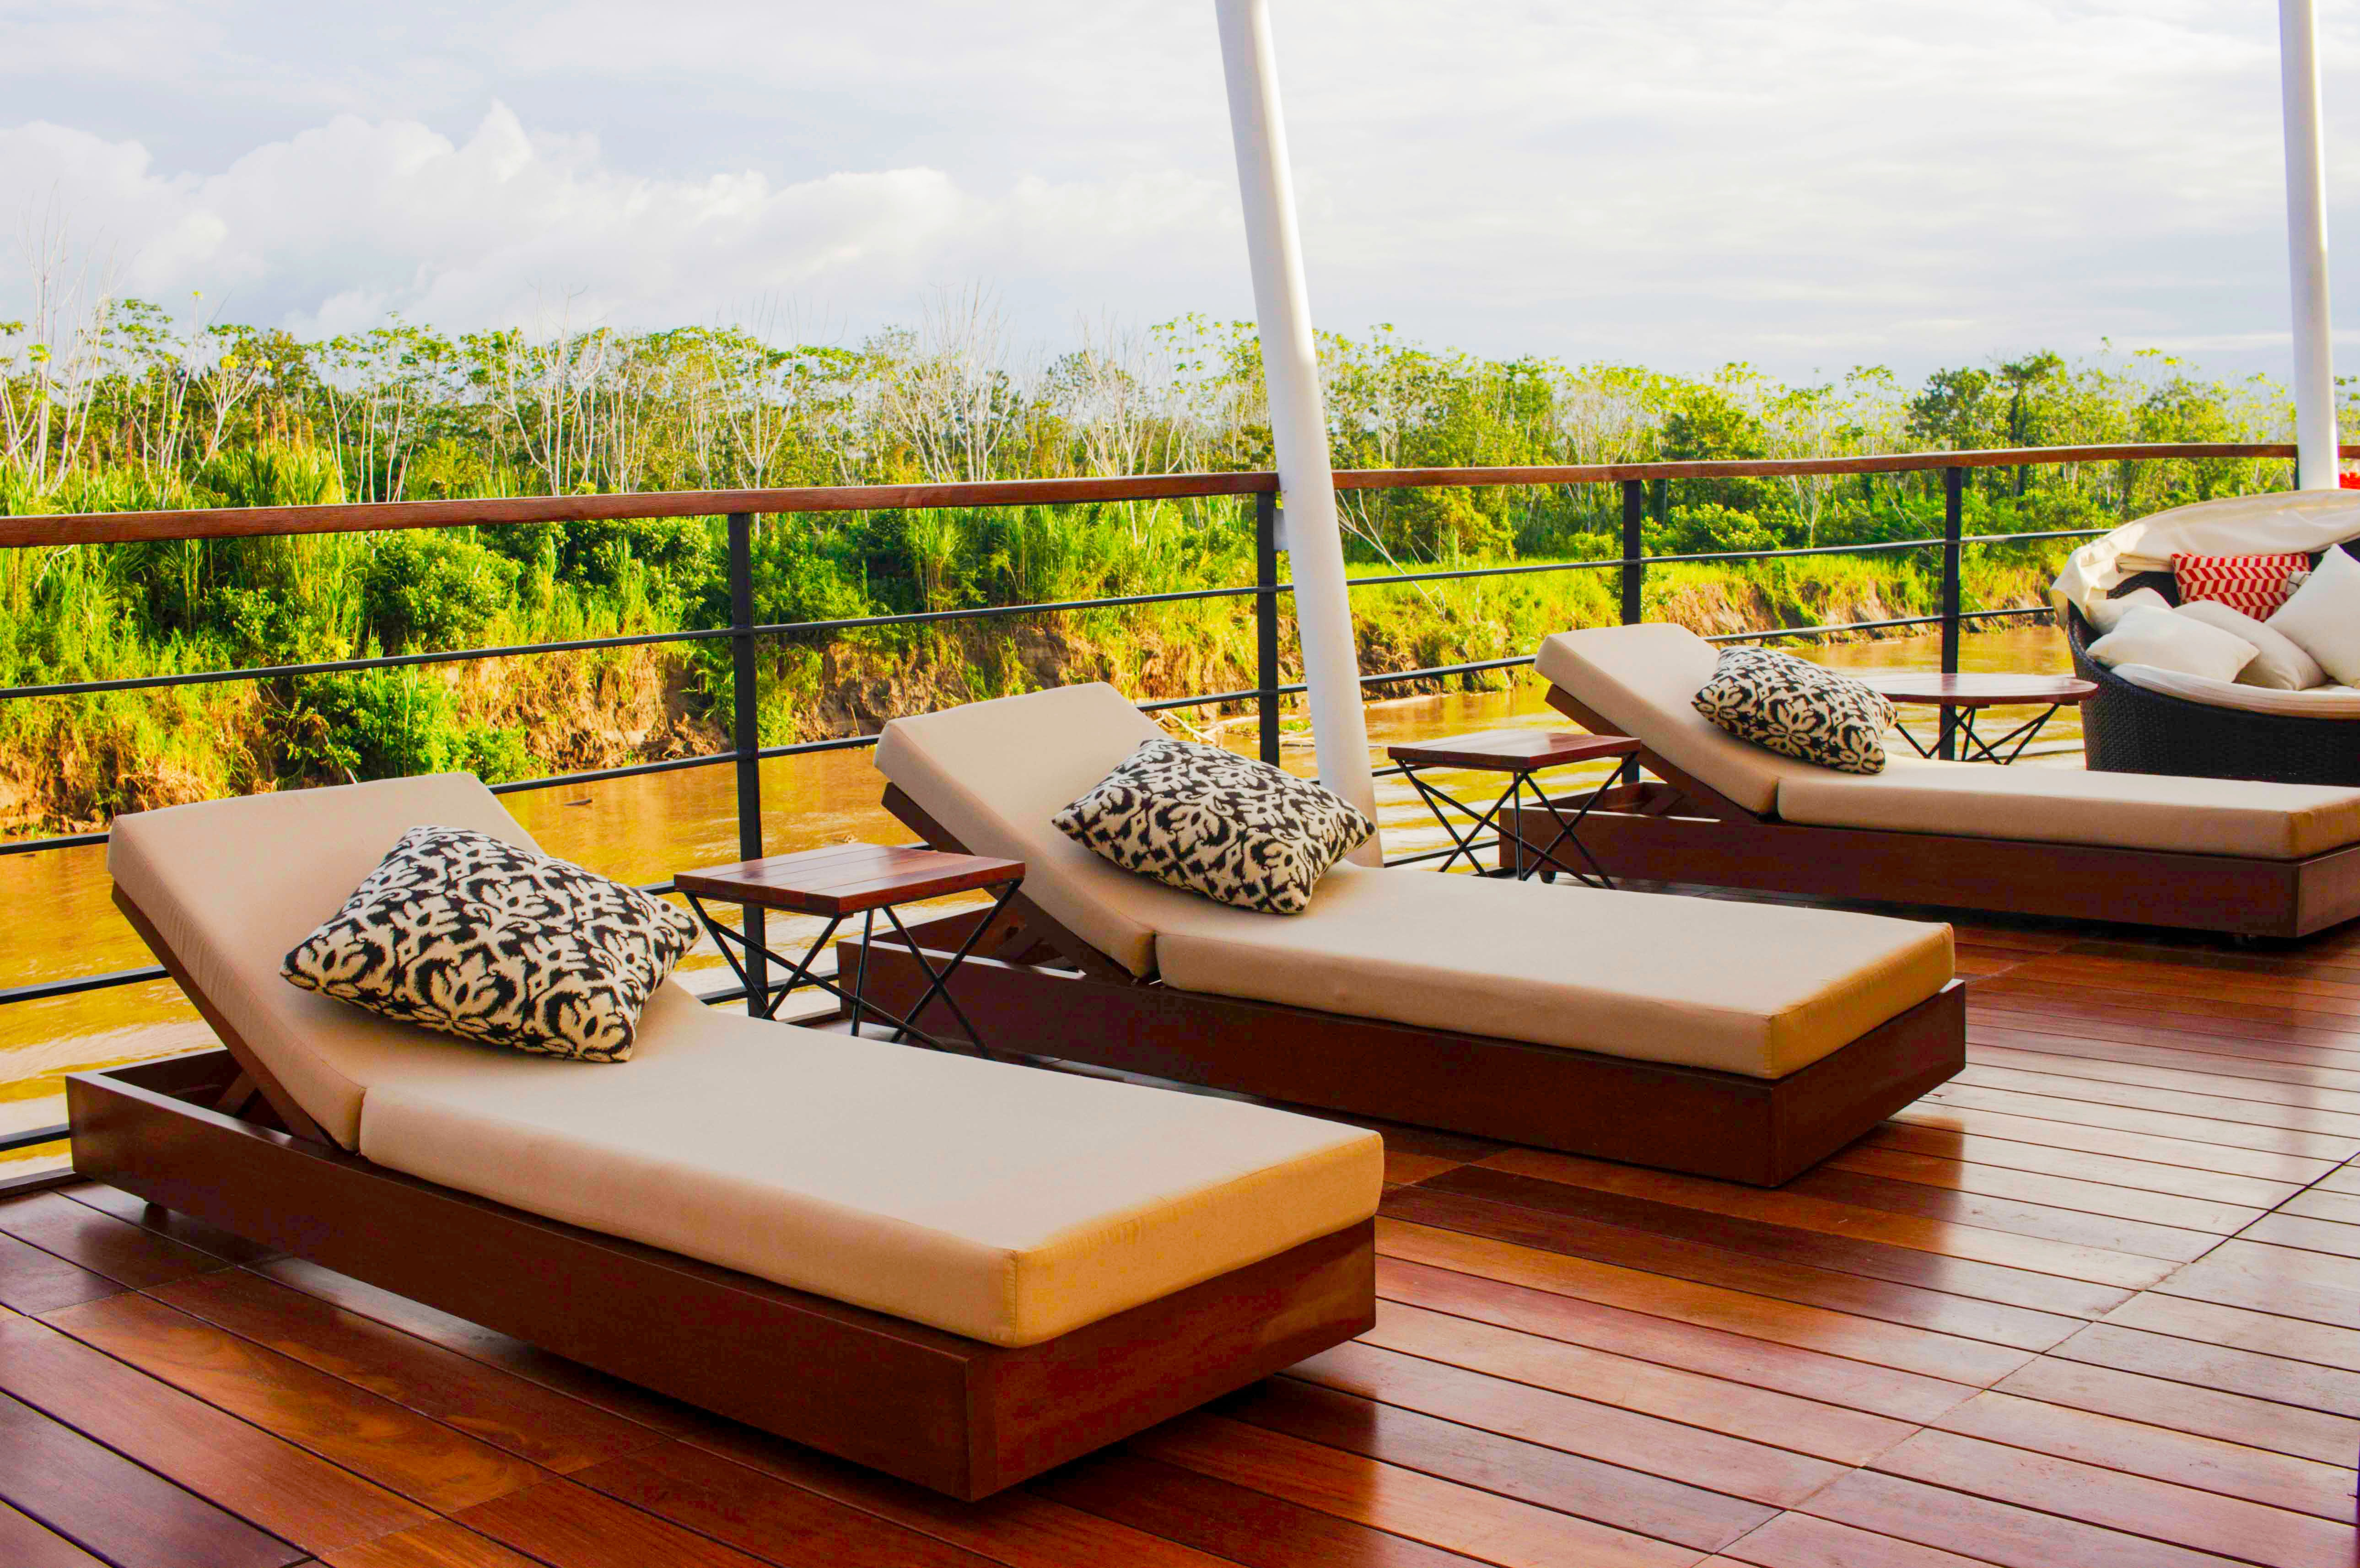 zafiro-Outdoor Lounge - Chairs